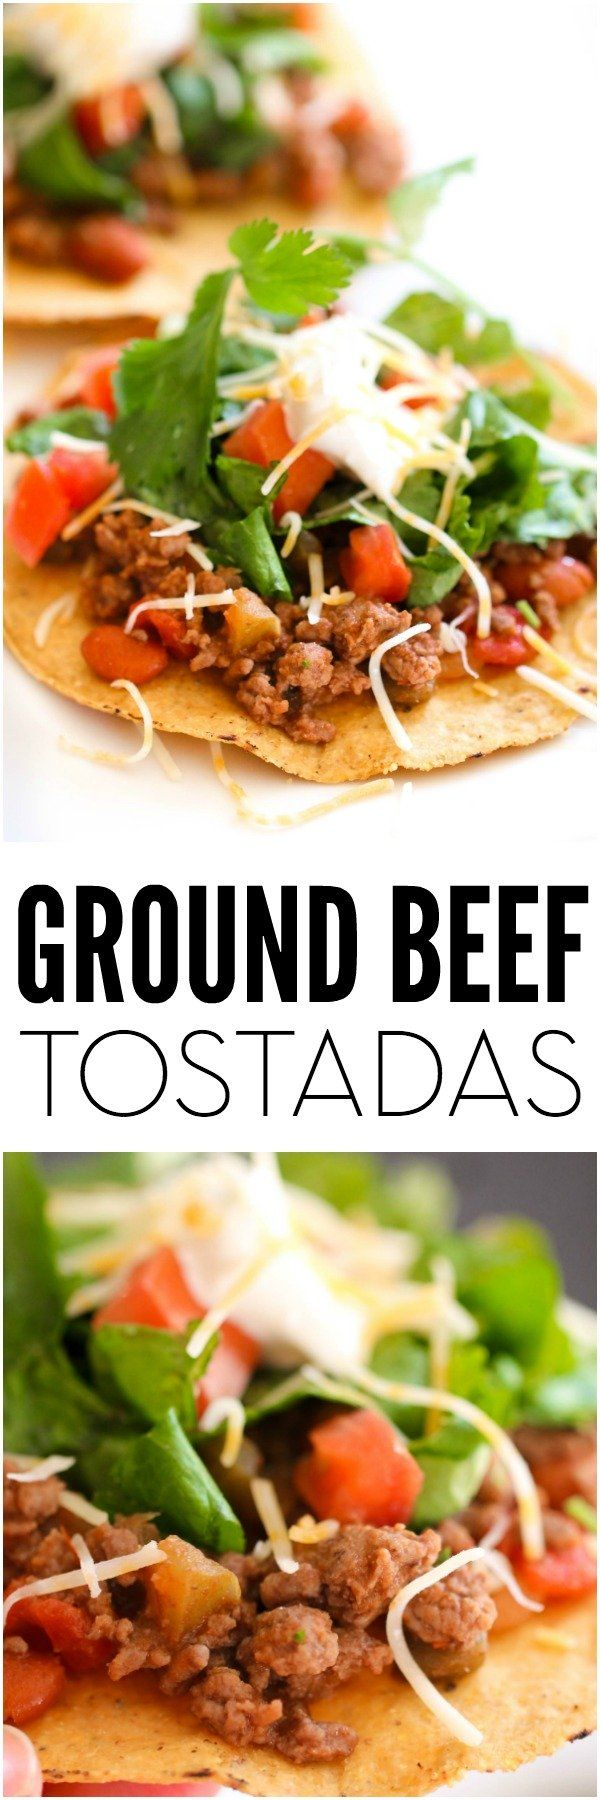 Ground Beef Tostadas   Six Sisters' Stuff